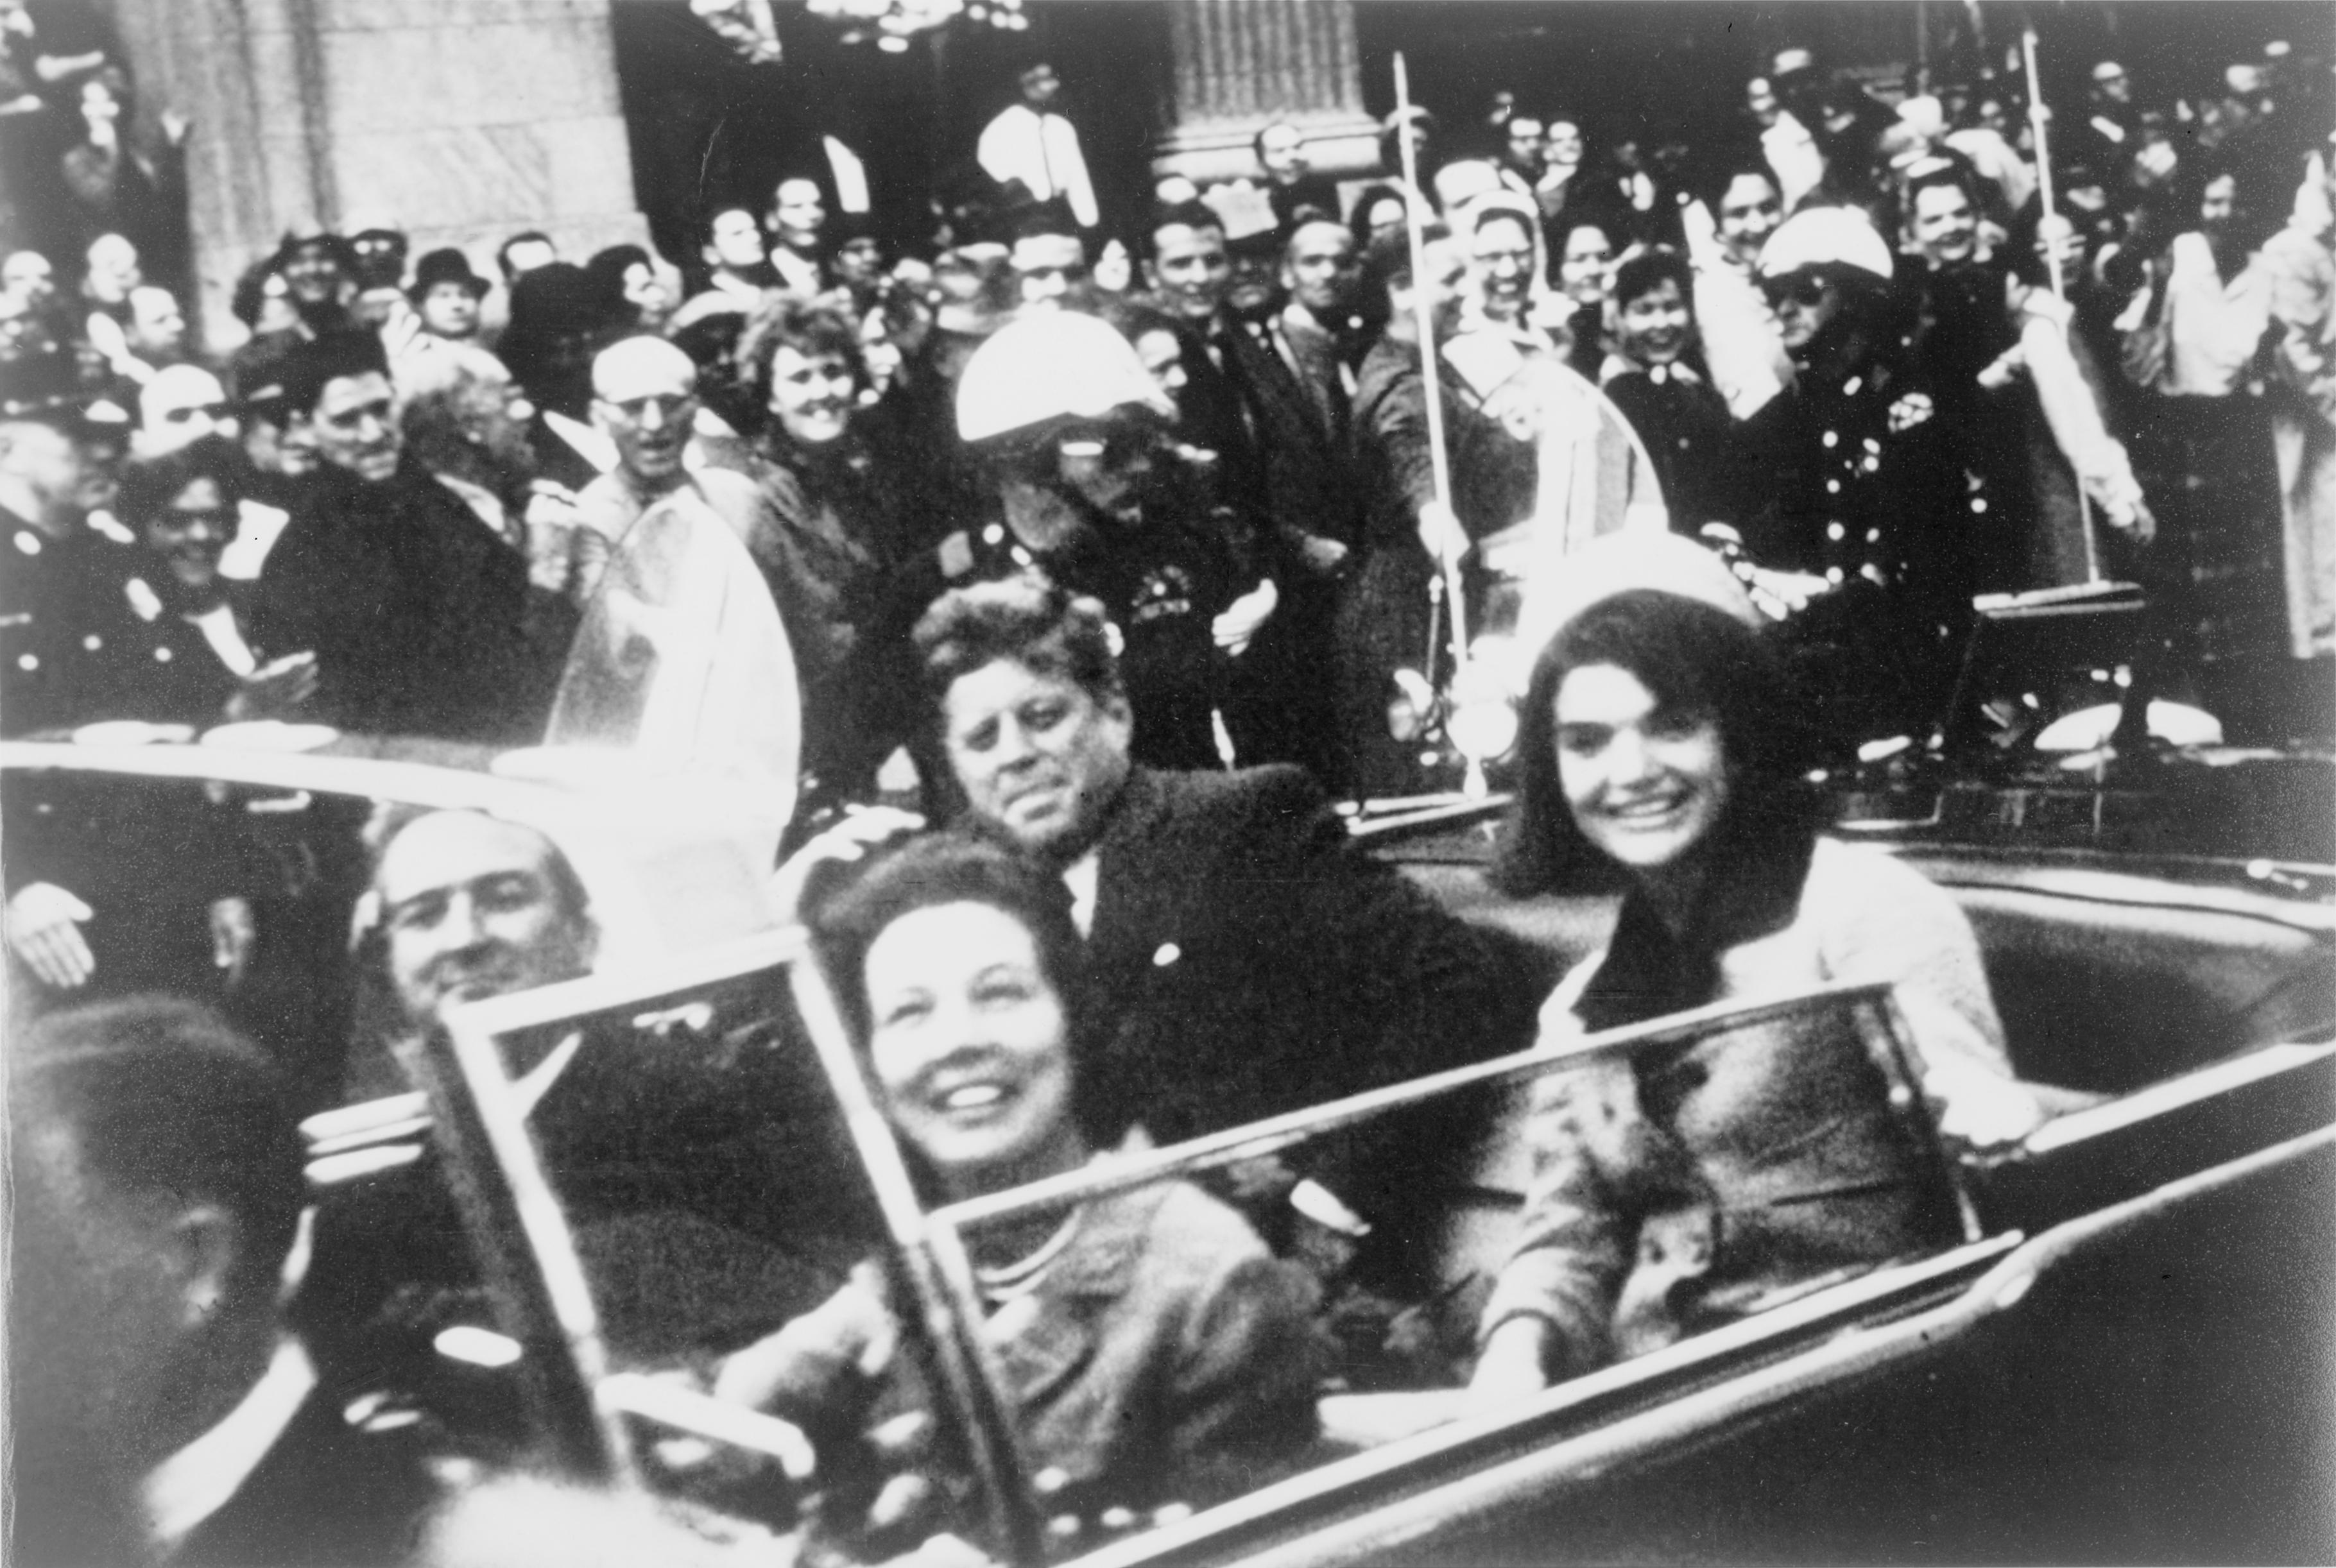 http://upload.wikimedia.org/wikipedia/commons/9/99/John_F._Kennedy_motorcade,_Dallas.jpg